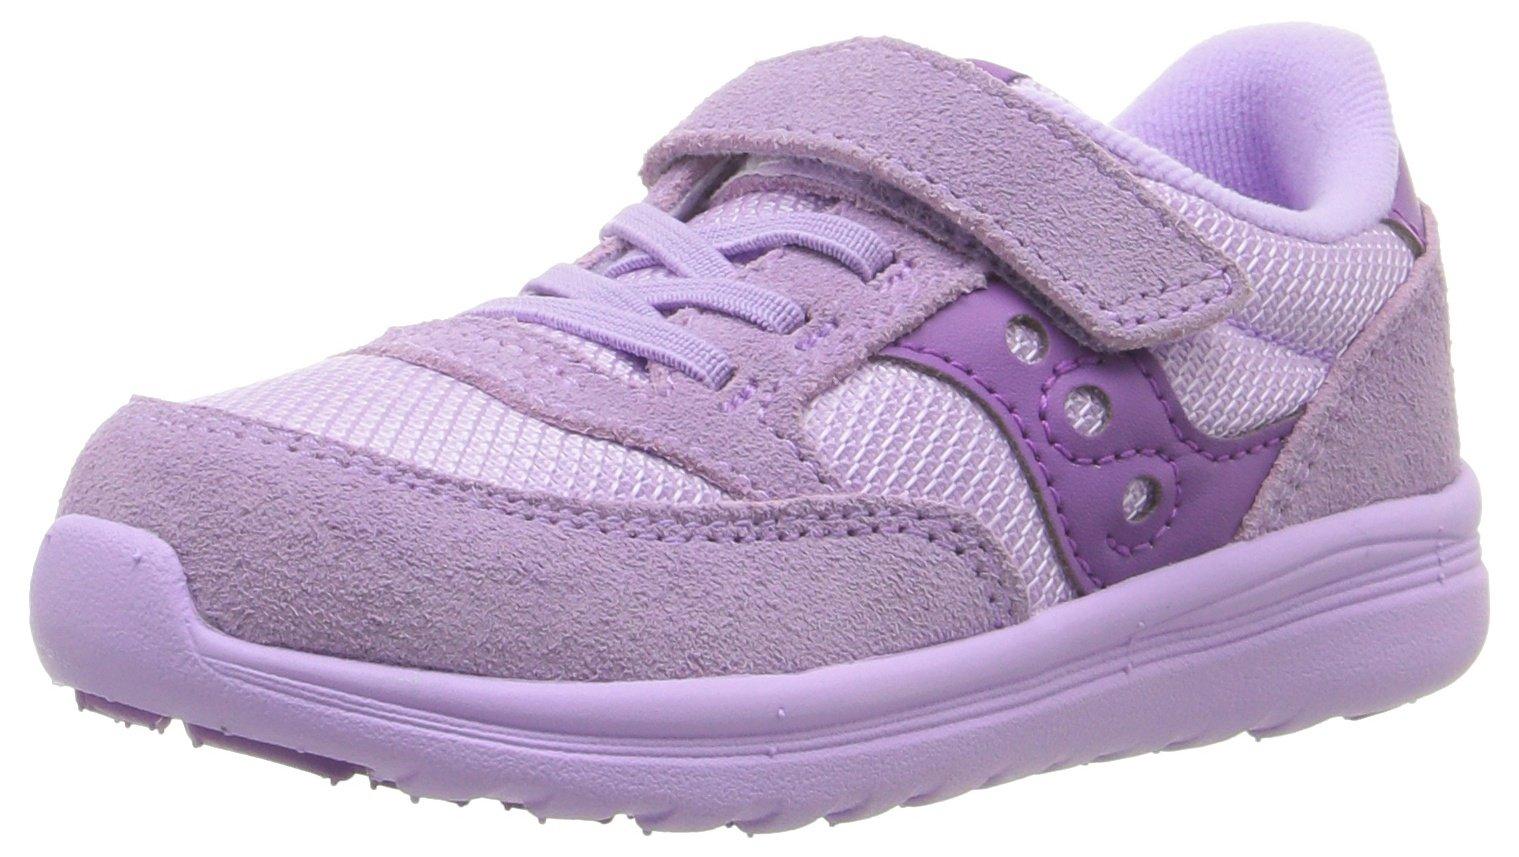 Saucony Baby Jazz Lite Sneaker (Toddler/Little Kid/Big Kid), Purple, 8.5 M US Toddler